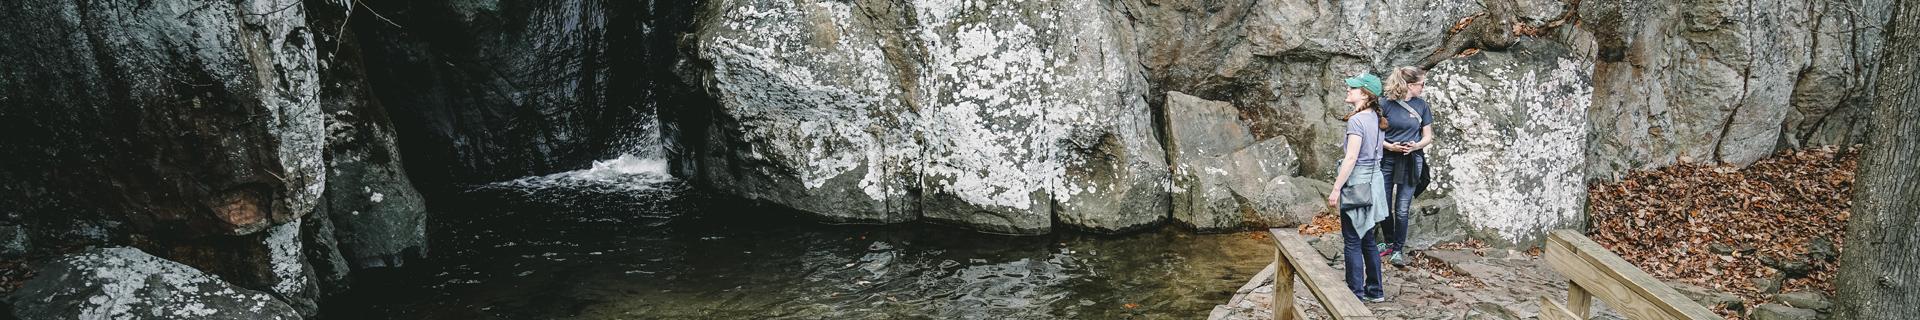 St. Elmo waterfall